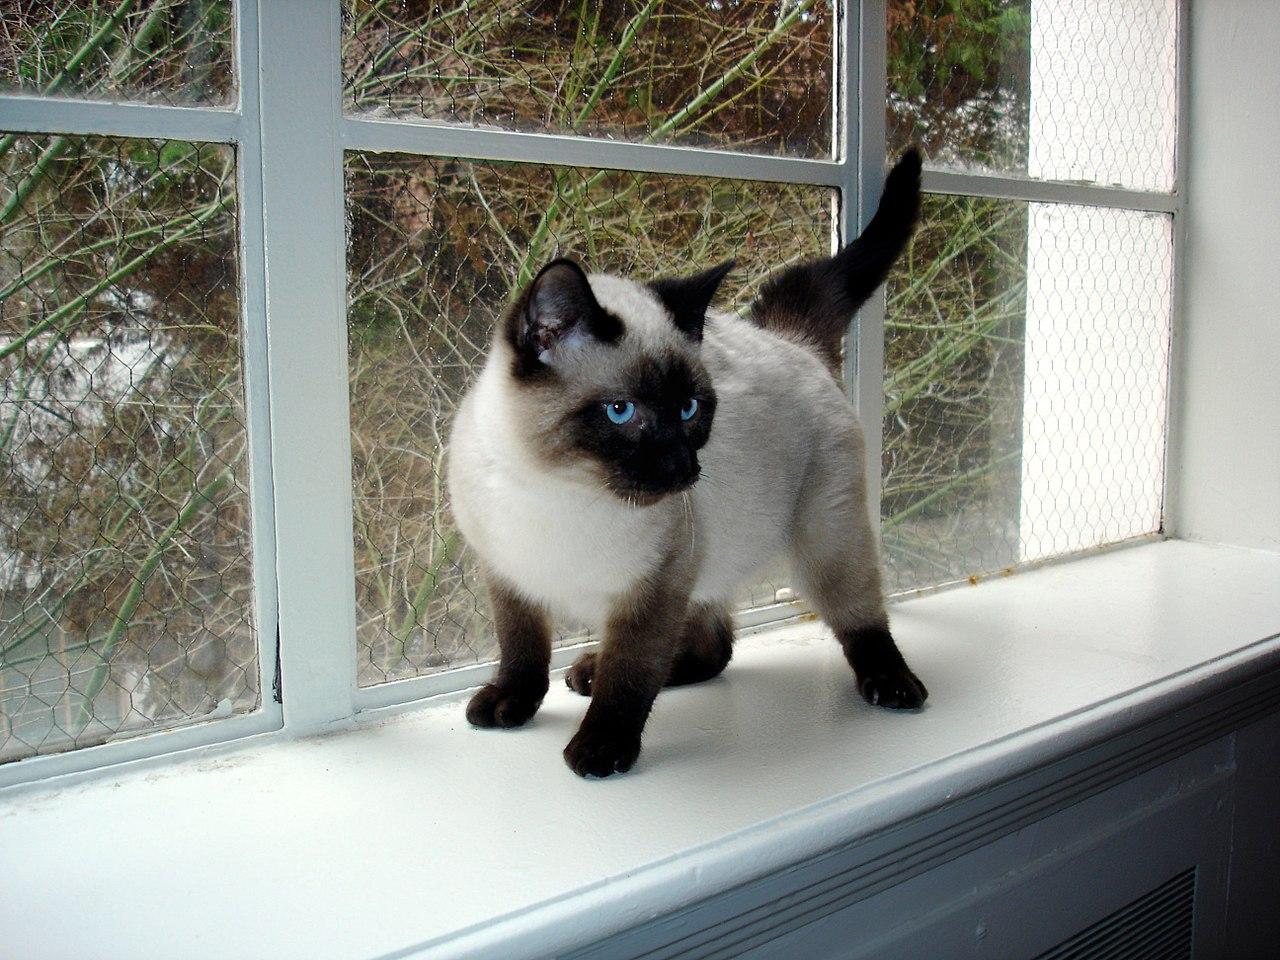 File:Seal Point Siamese Kitten.JPG - Wikimedia Commons